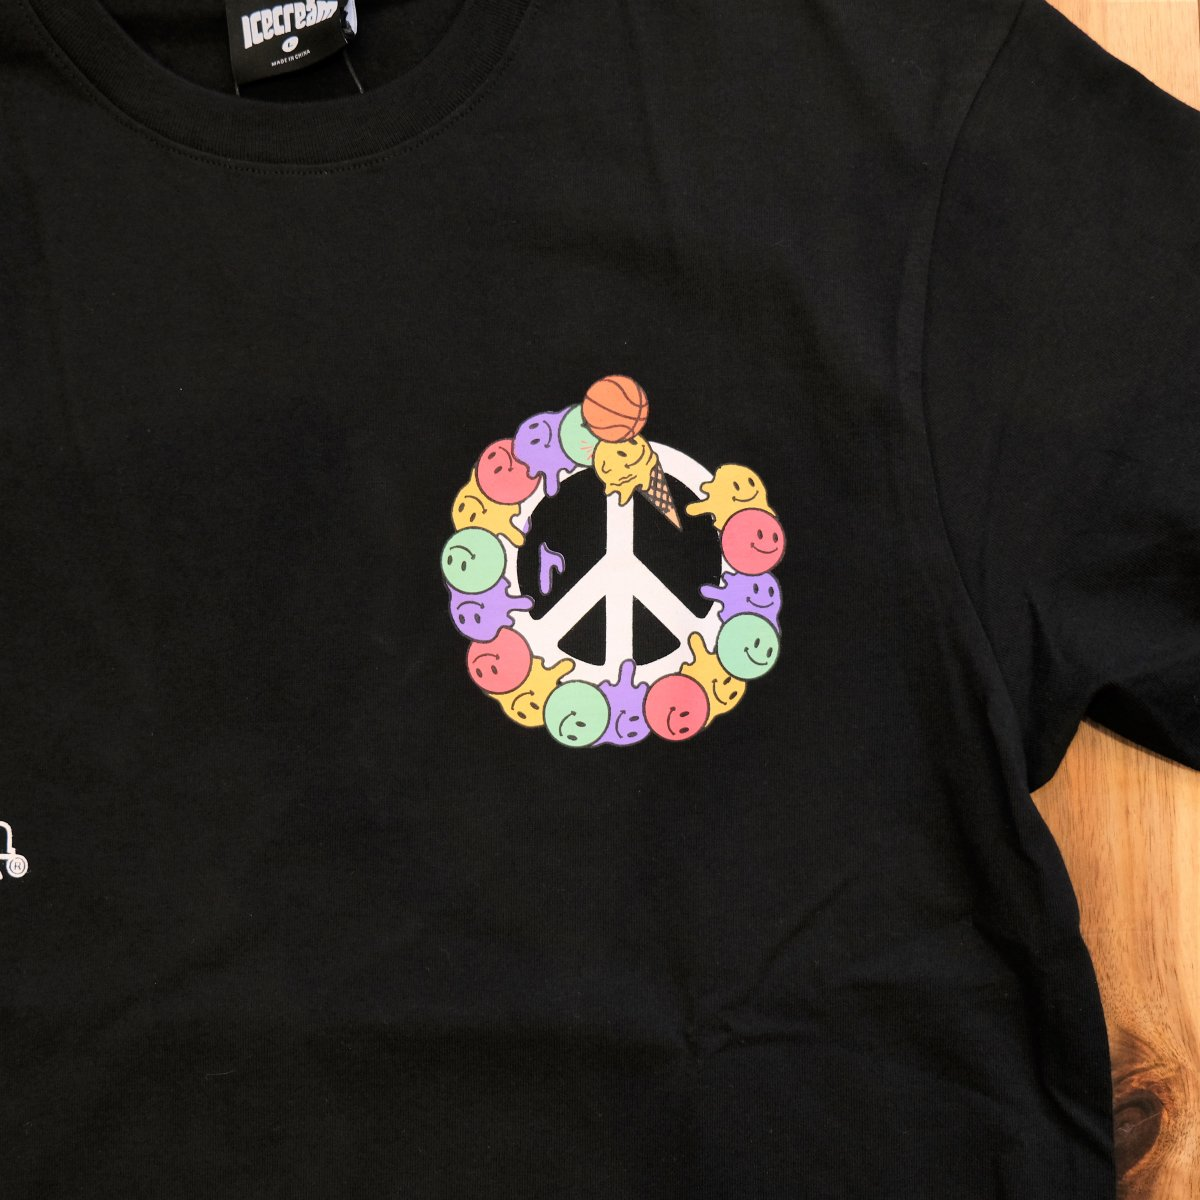 <img class='new_mark_img1' src='https://img.shop-pro.jp/img/new/icons3.gif' style='border:none;display:inline;margin:0px;padding:0px;width:auto;' />ICE CREAM アイスクリーム / Tシャツ PEACE T-SHIRT 【BLACK】